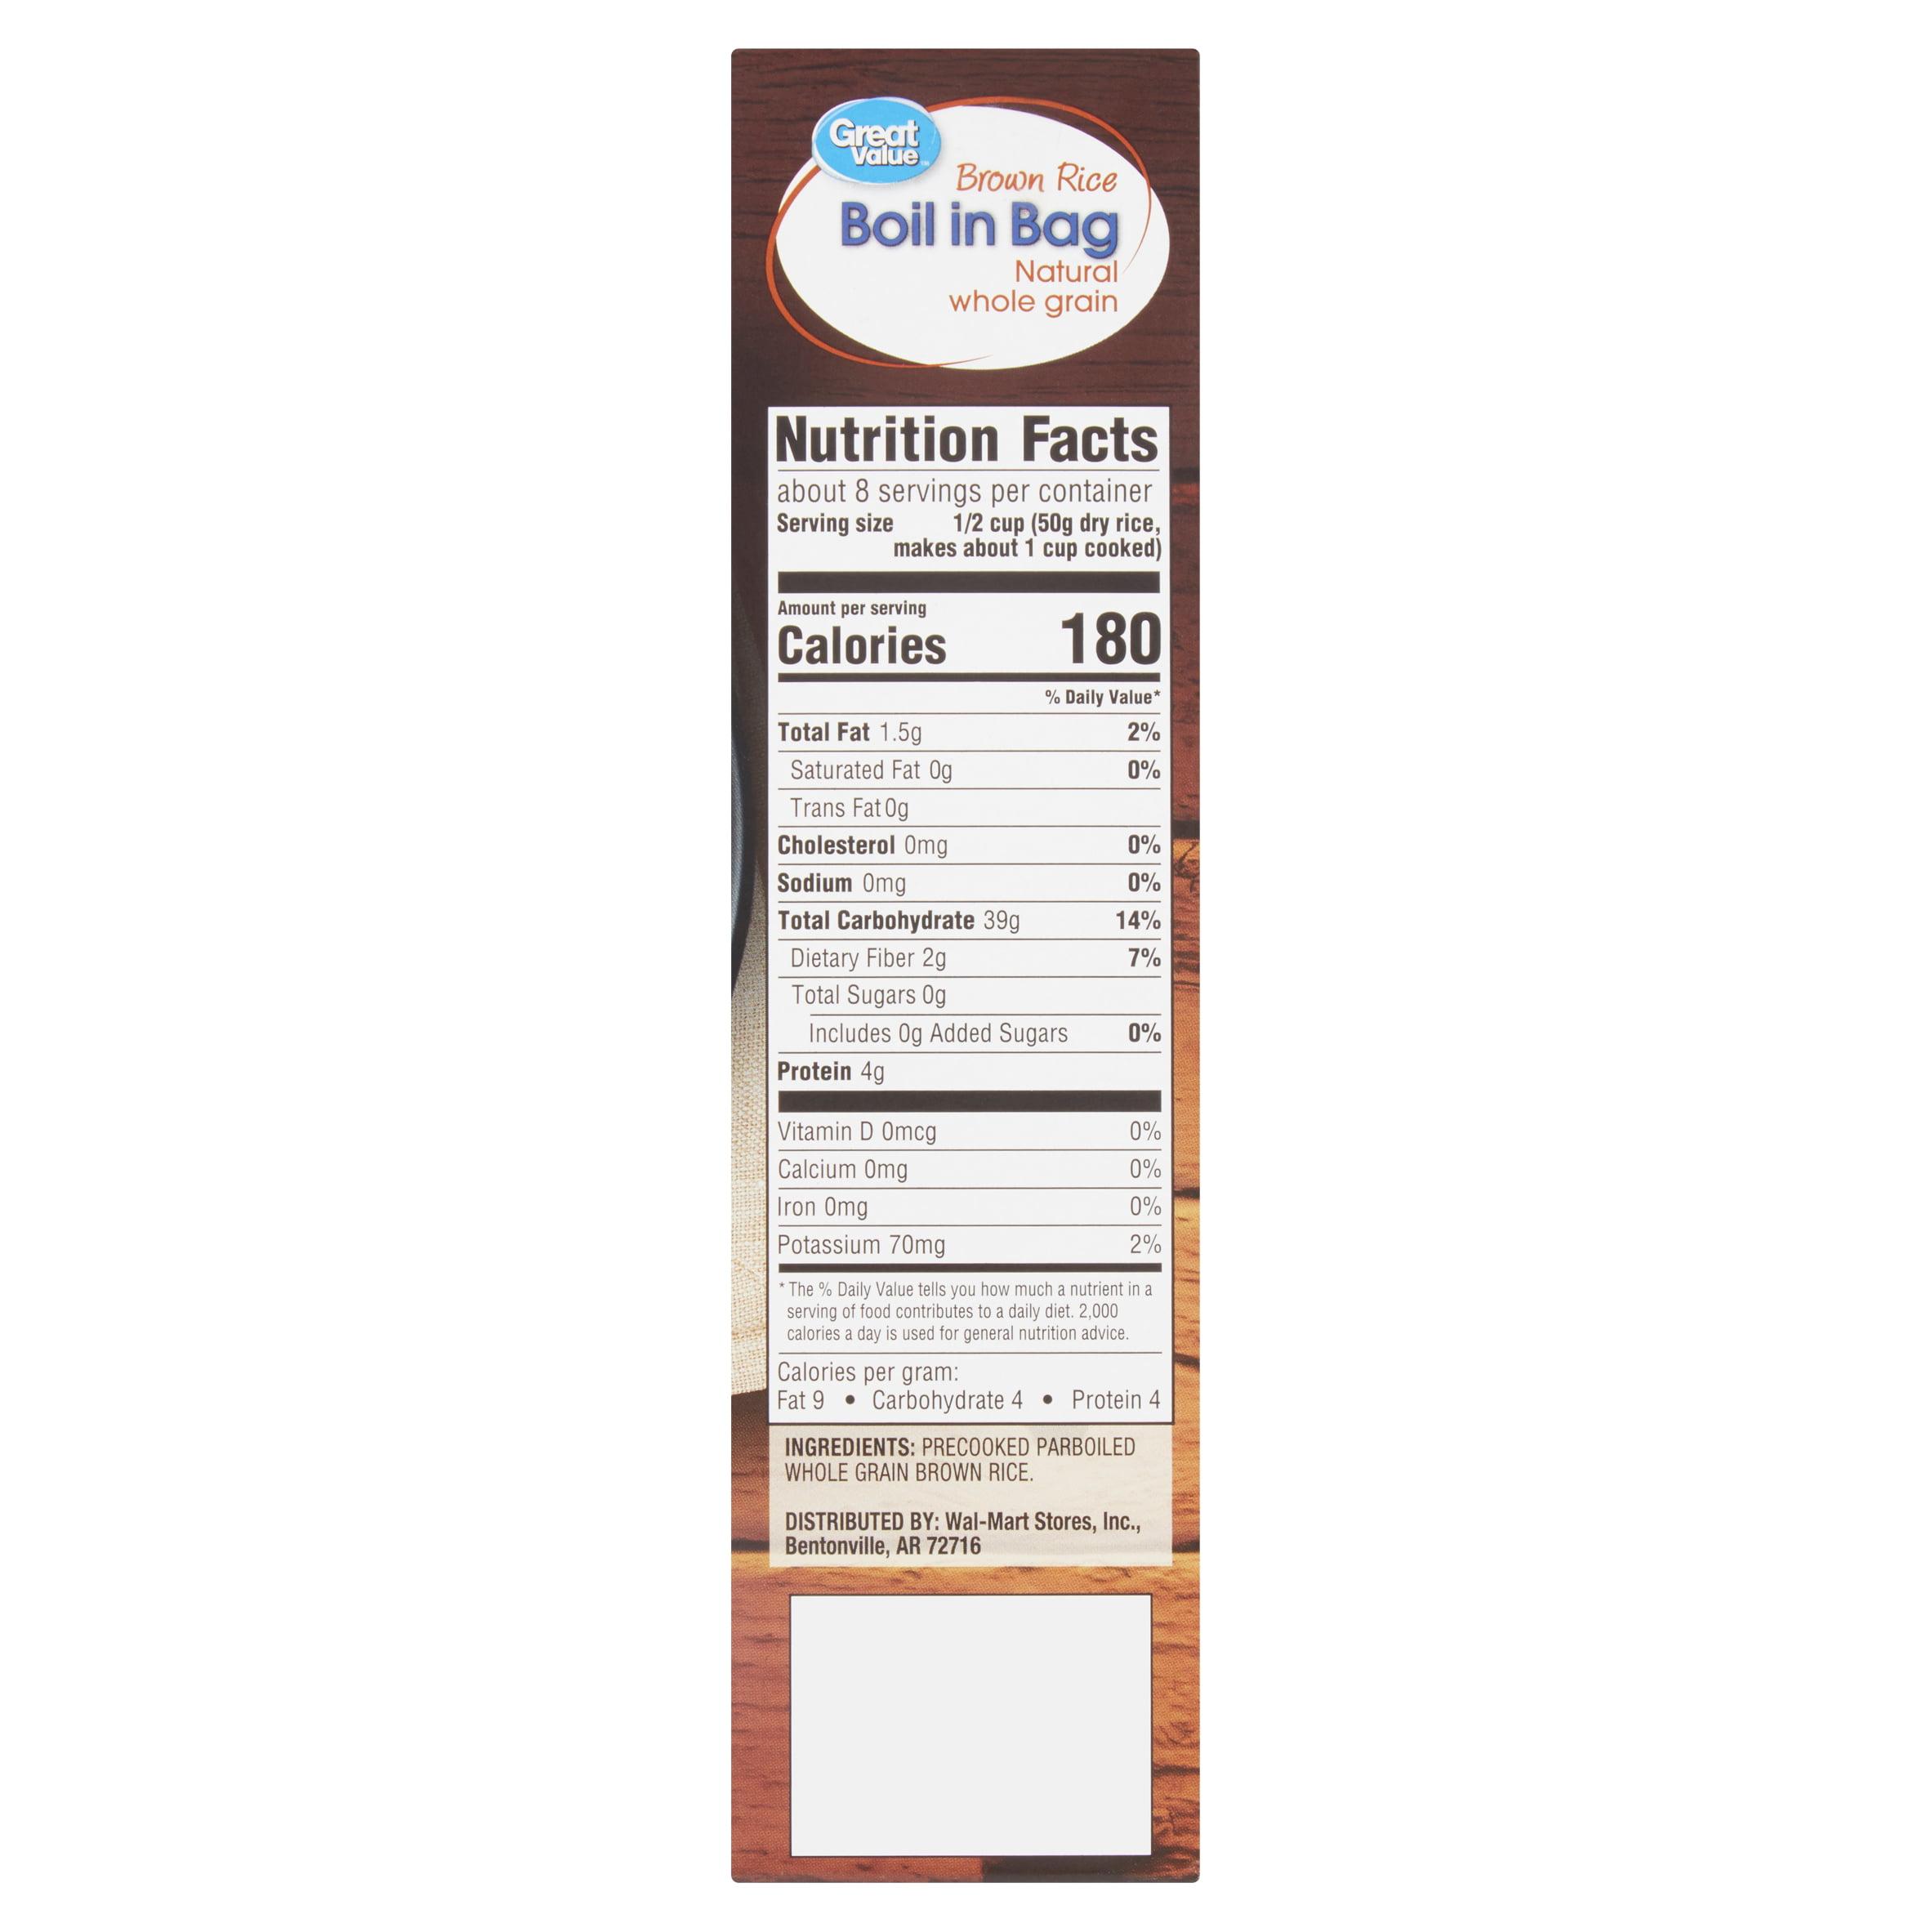 Great Value Boil in Bag Brown Rice, 4 count, 14 oz - Walmart com